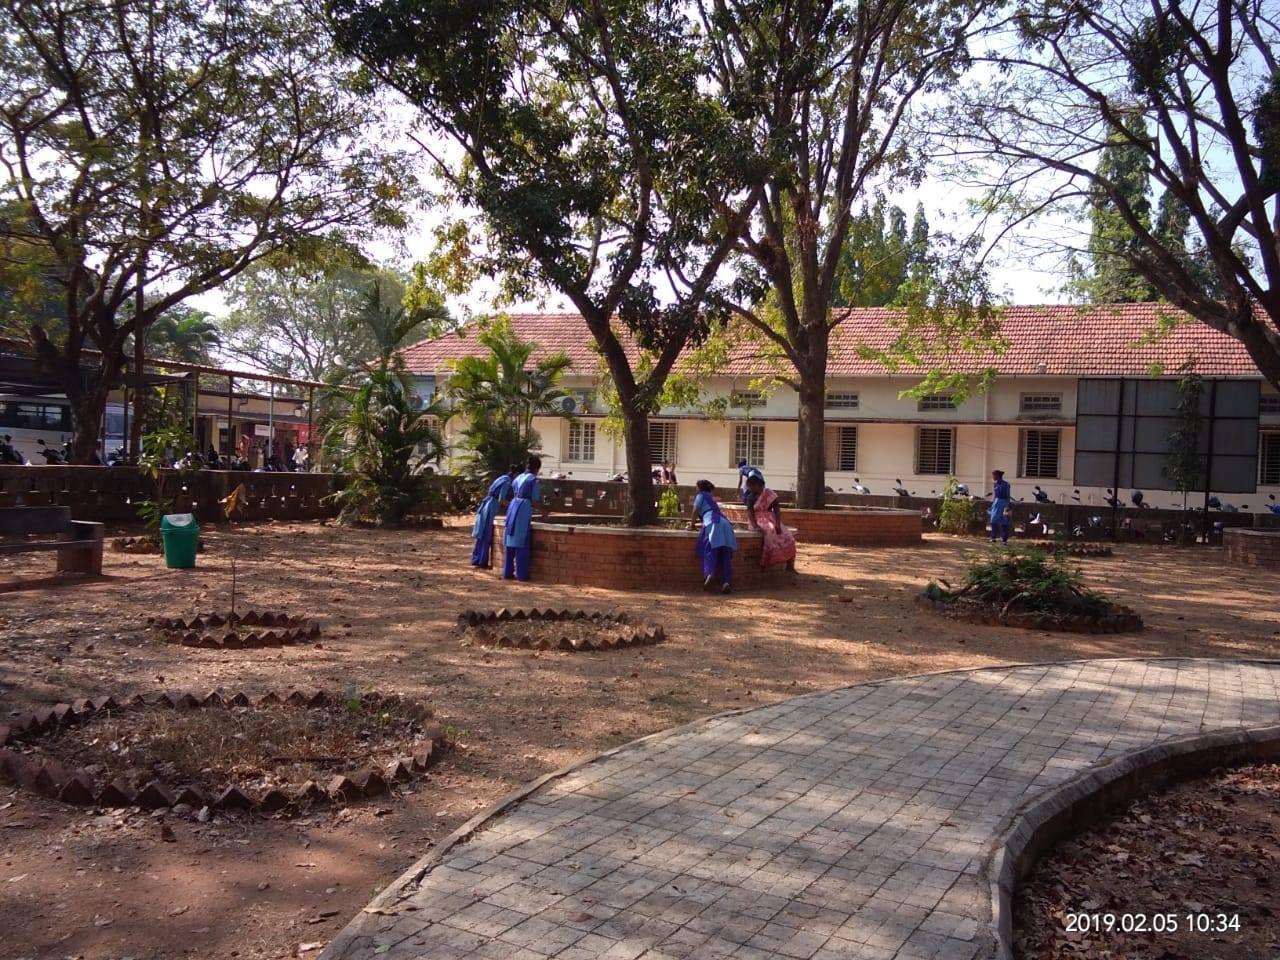 Community Service Project in Karnataka State, India / Sharmin Banu M S / Scouts India